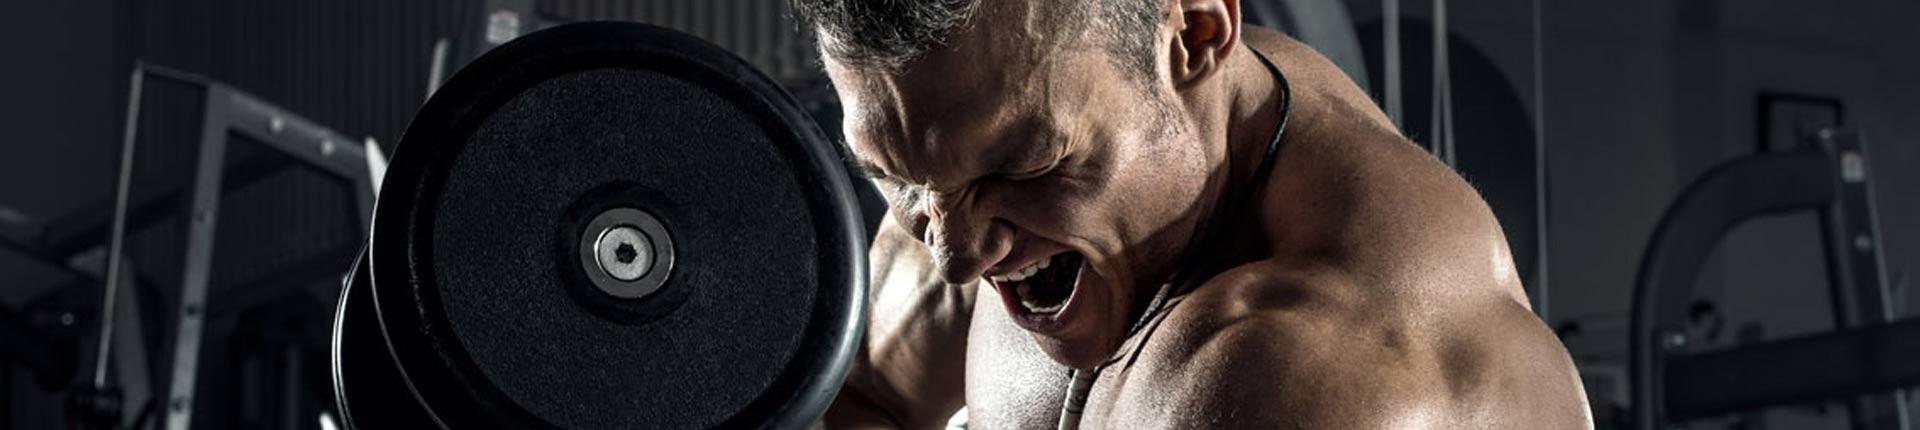 Trening FBW, Full Body Workout - hit czy kit?